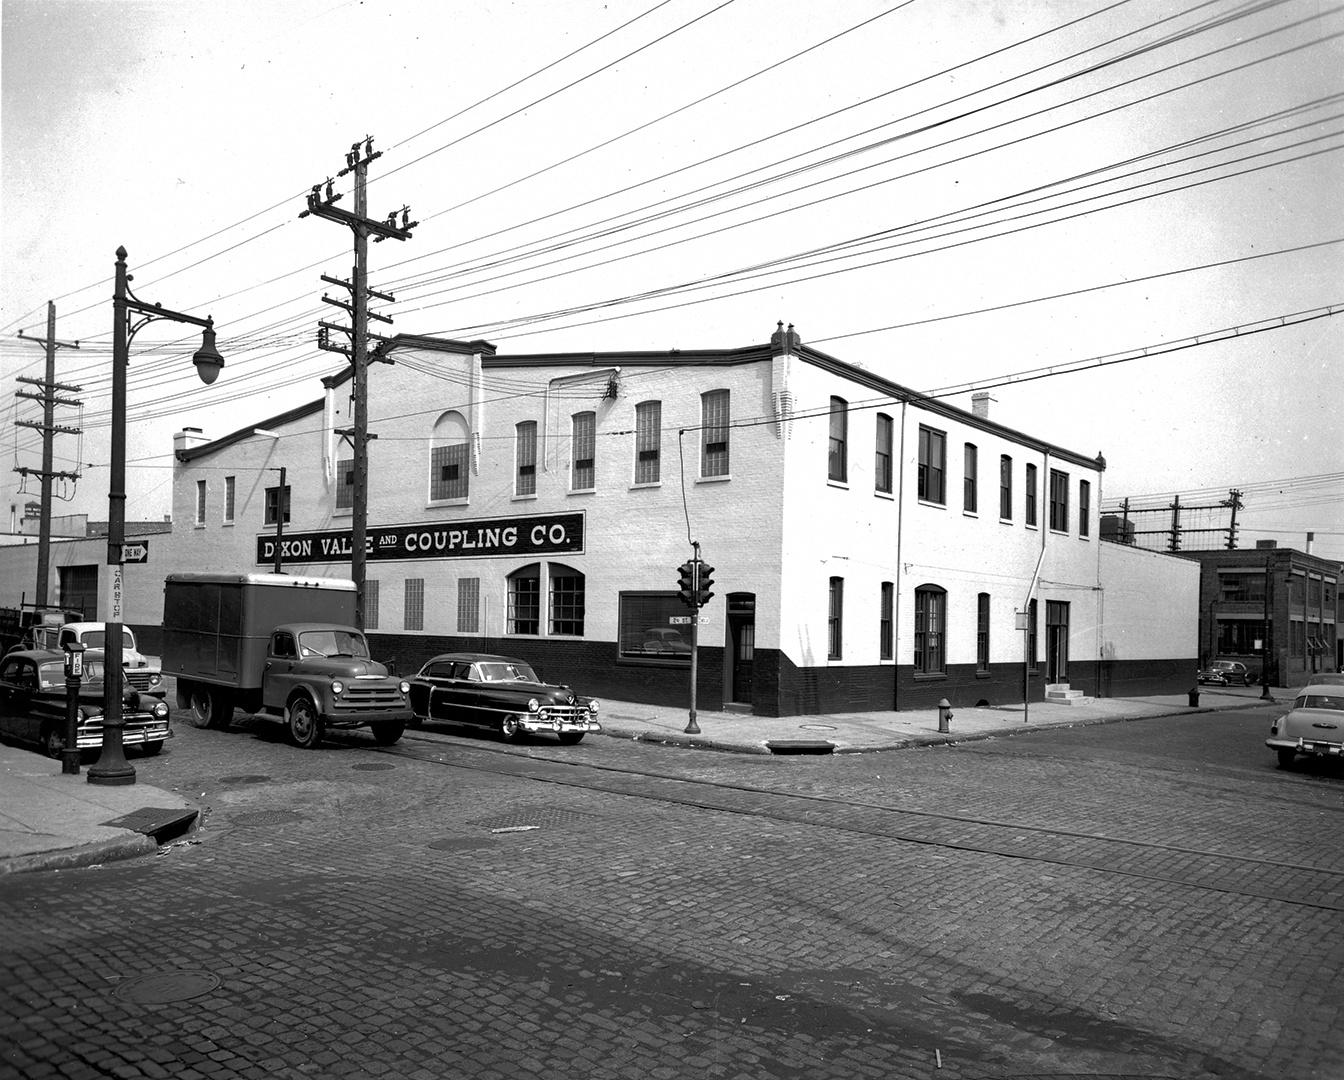 warehouse & shipping in philadelphia